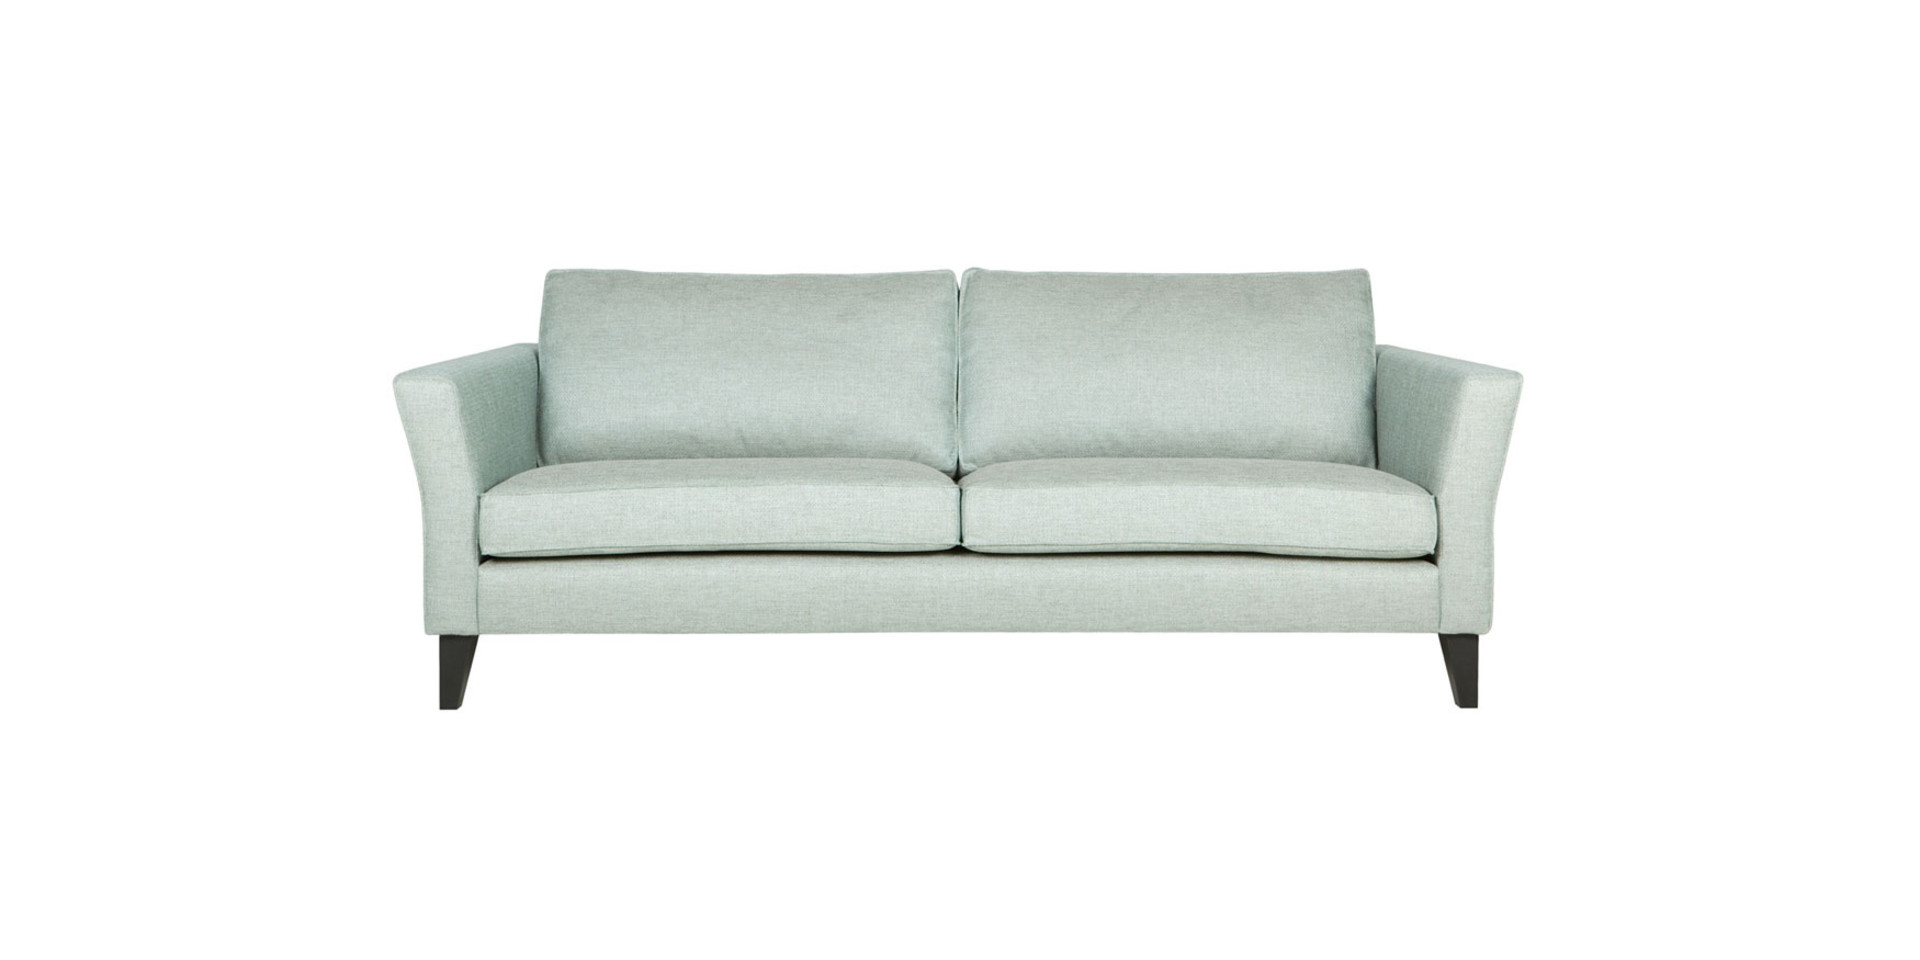 sits-caprice-canape-3seater_himalaya7_green_1